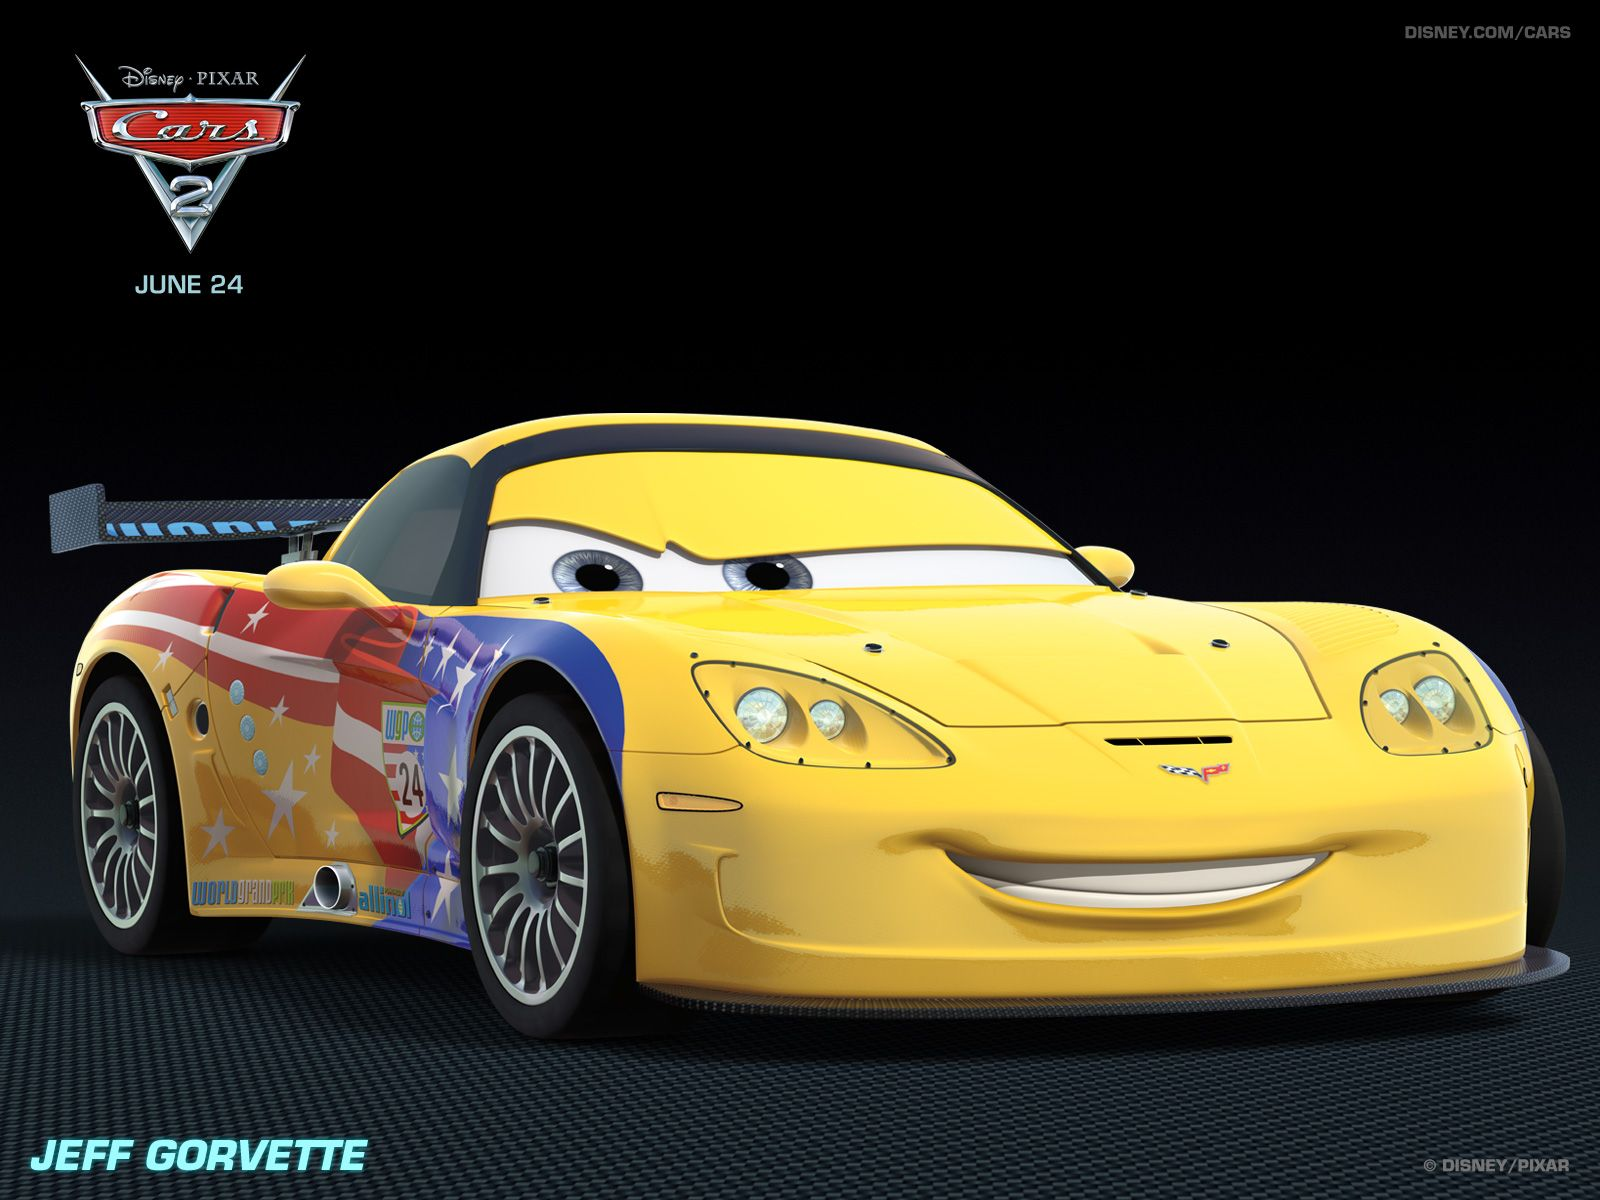 Jeff Gorvette Disney Cars Disney Pixar Cars Pixar Cars